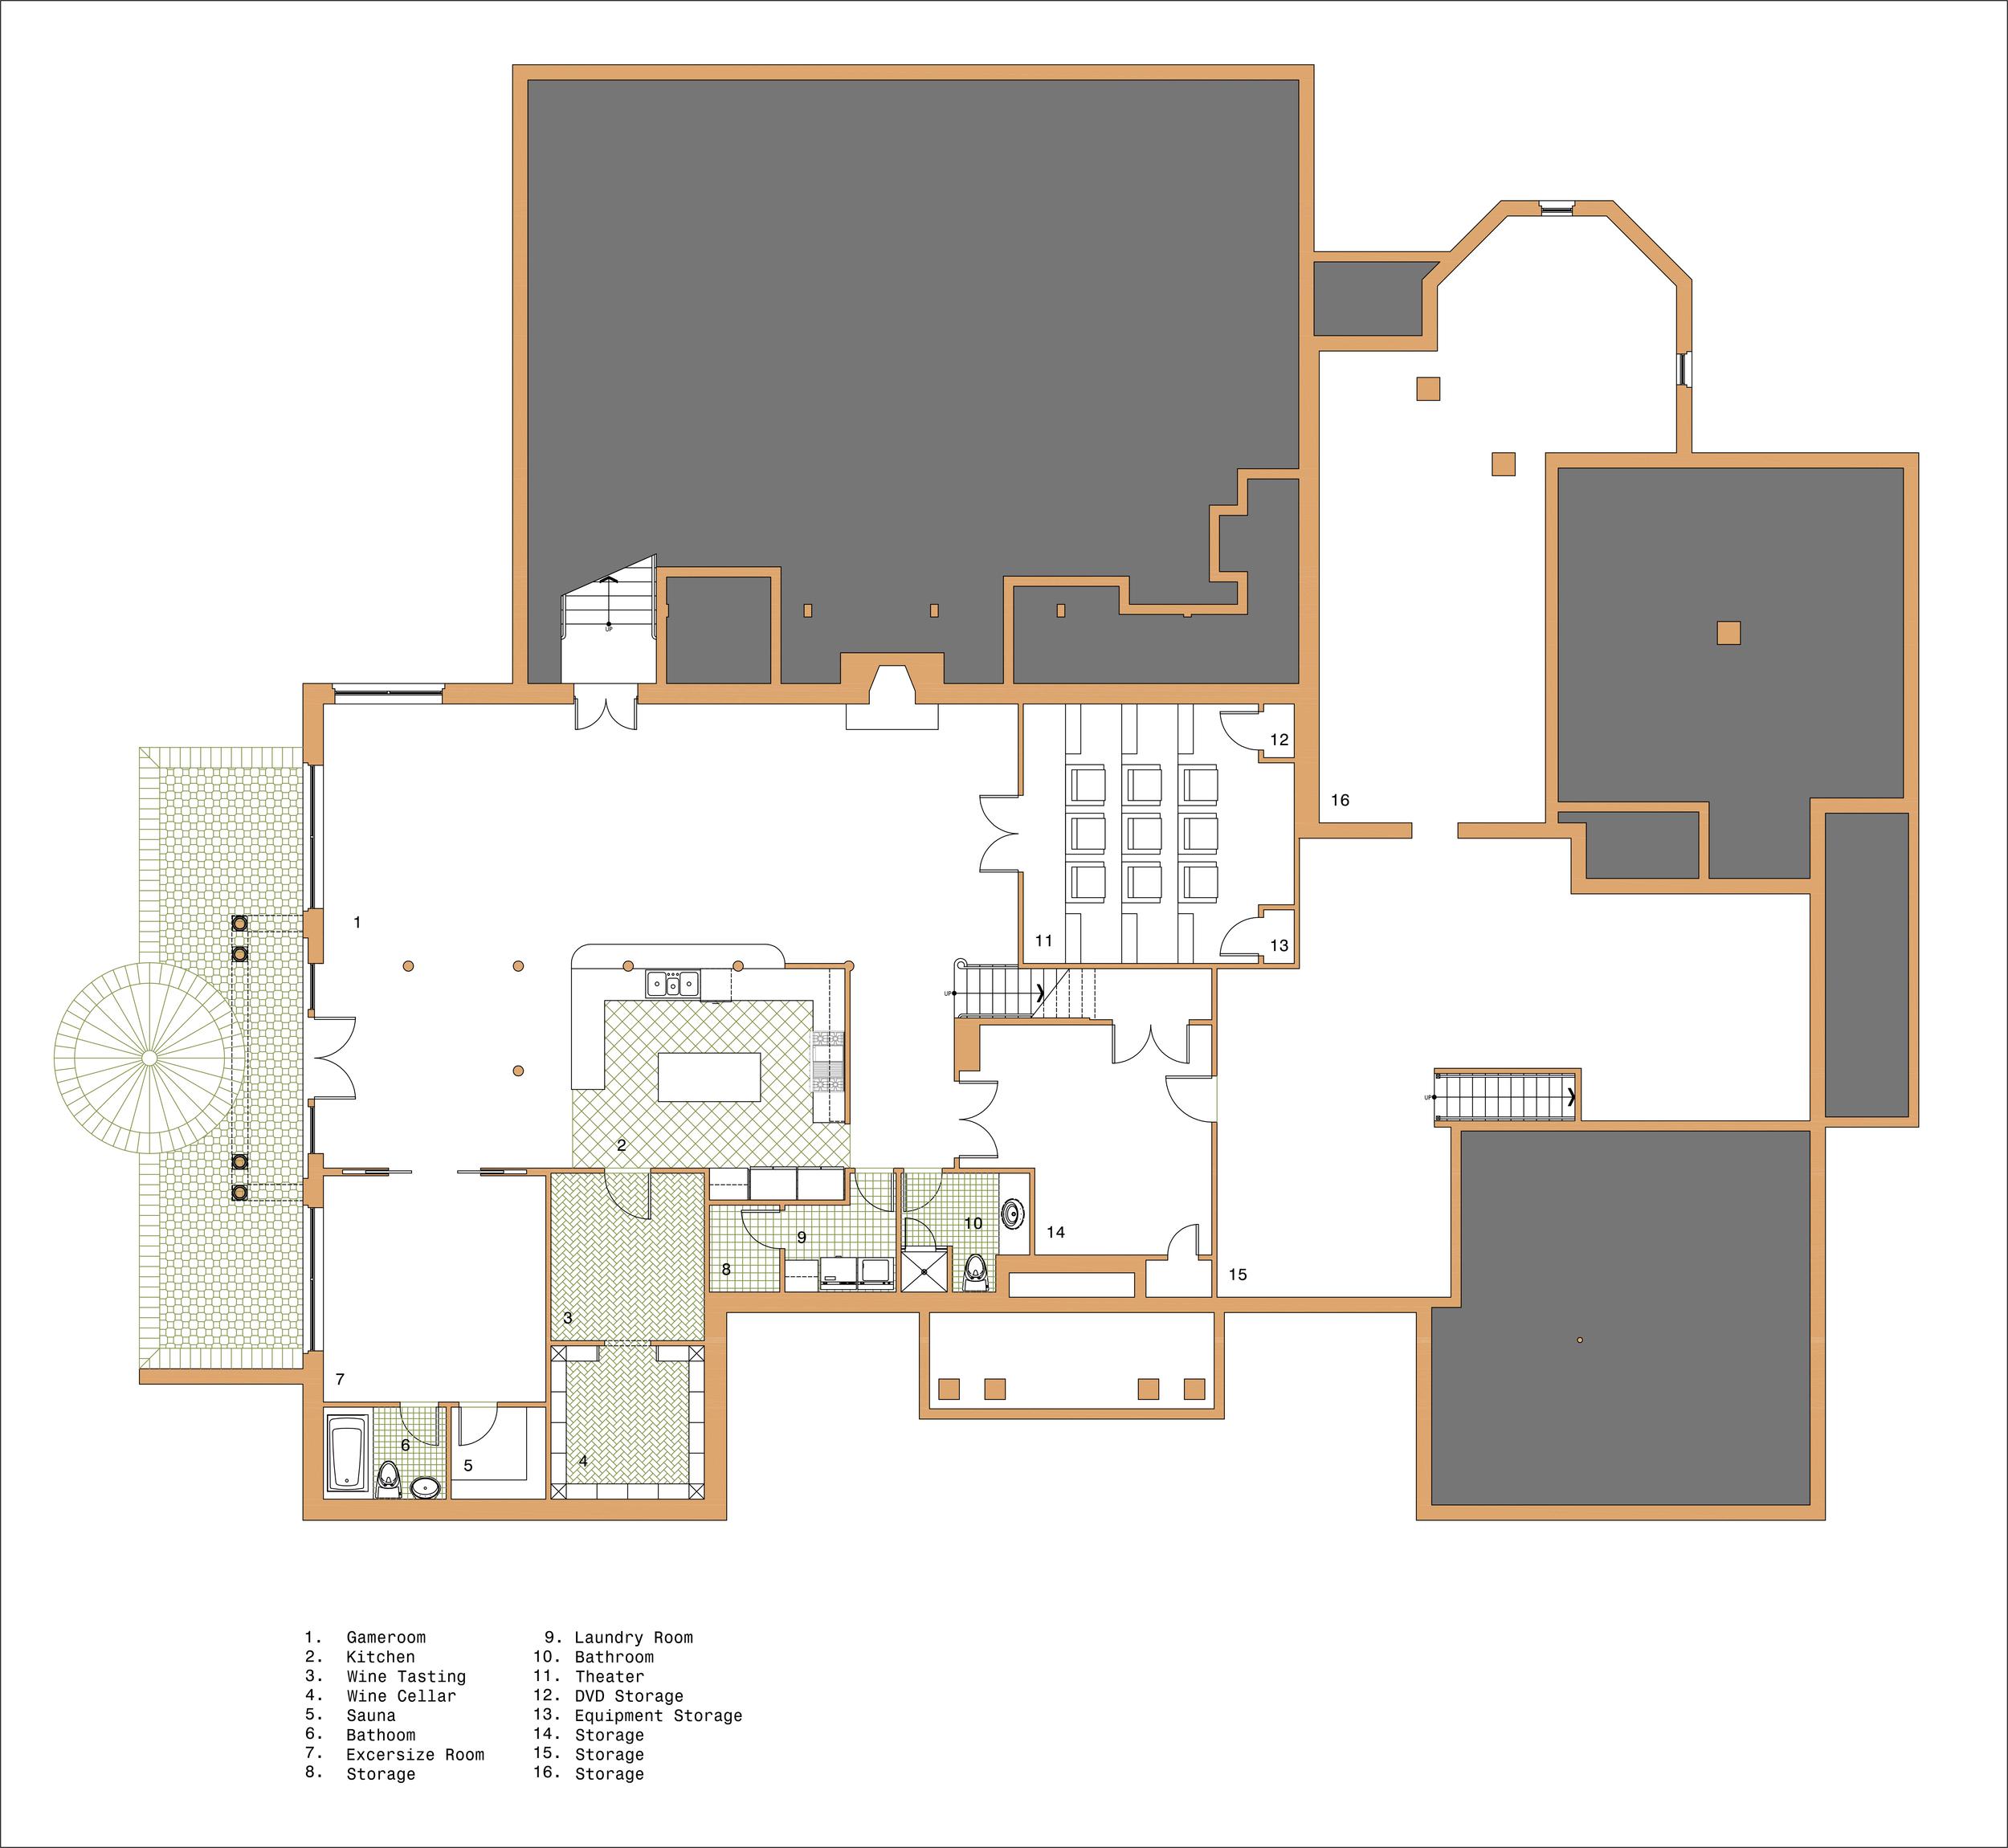 Proposed Basement Plan